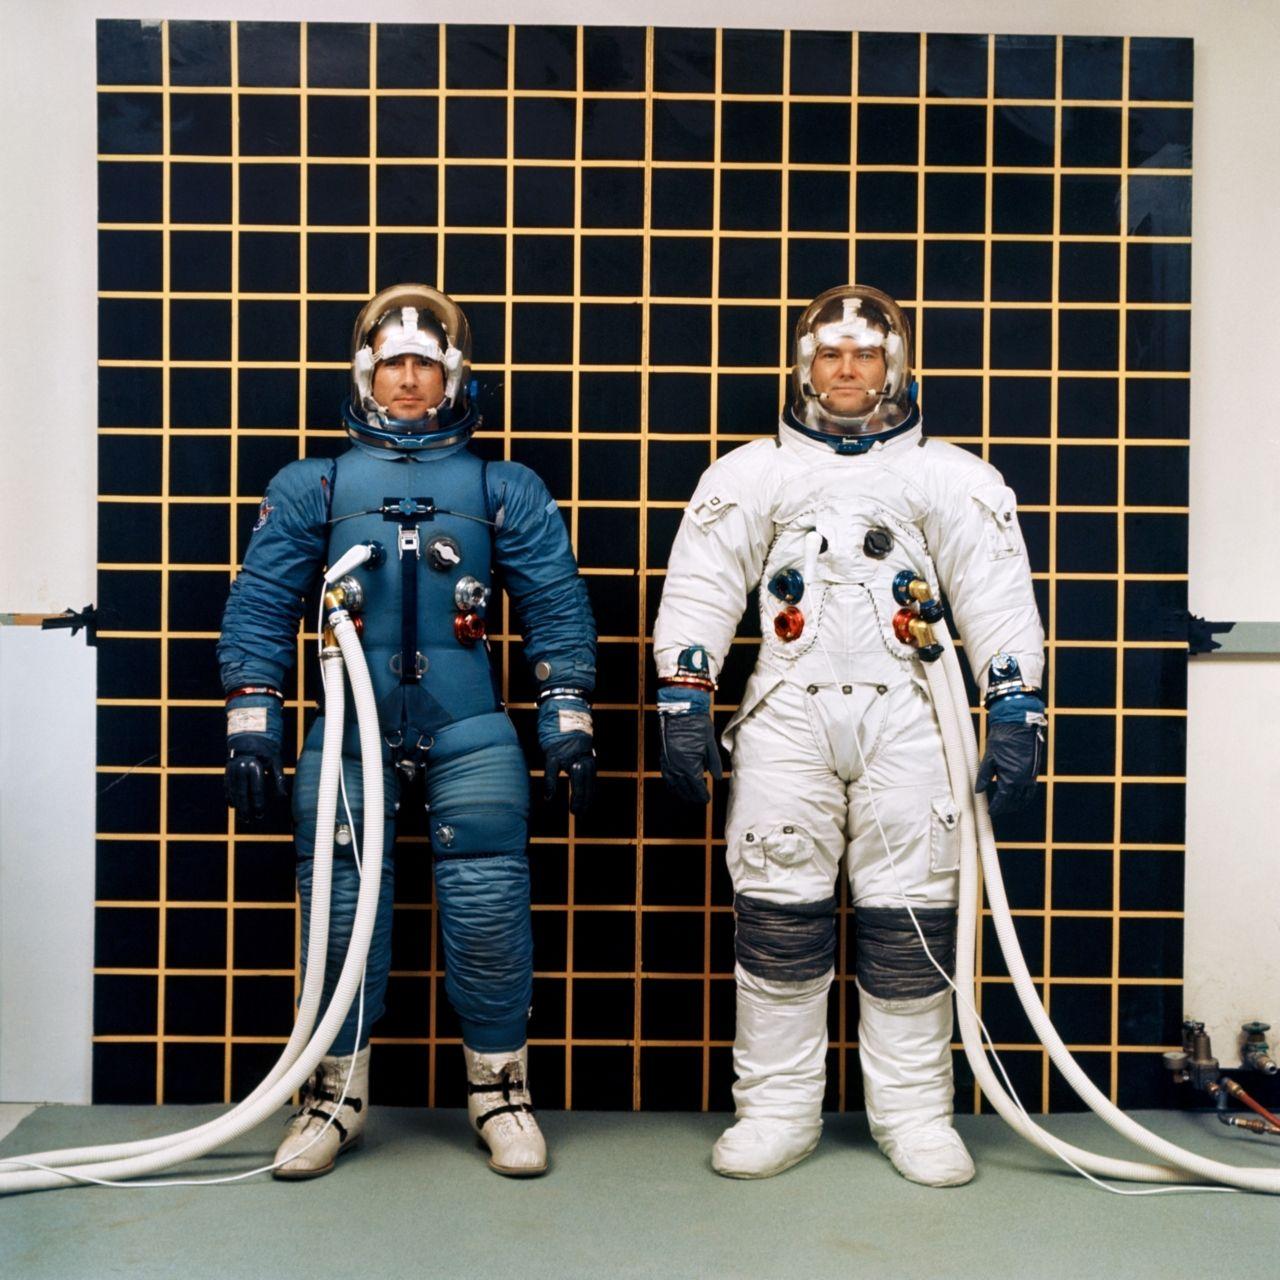 Astronauts Irwin and Bull model the Apollo IVA